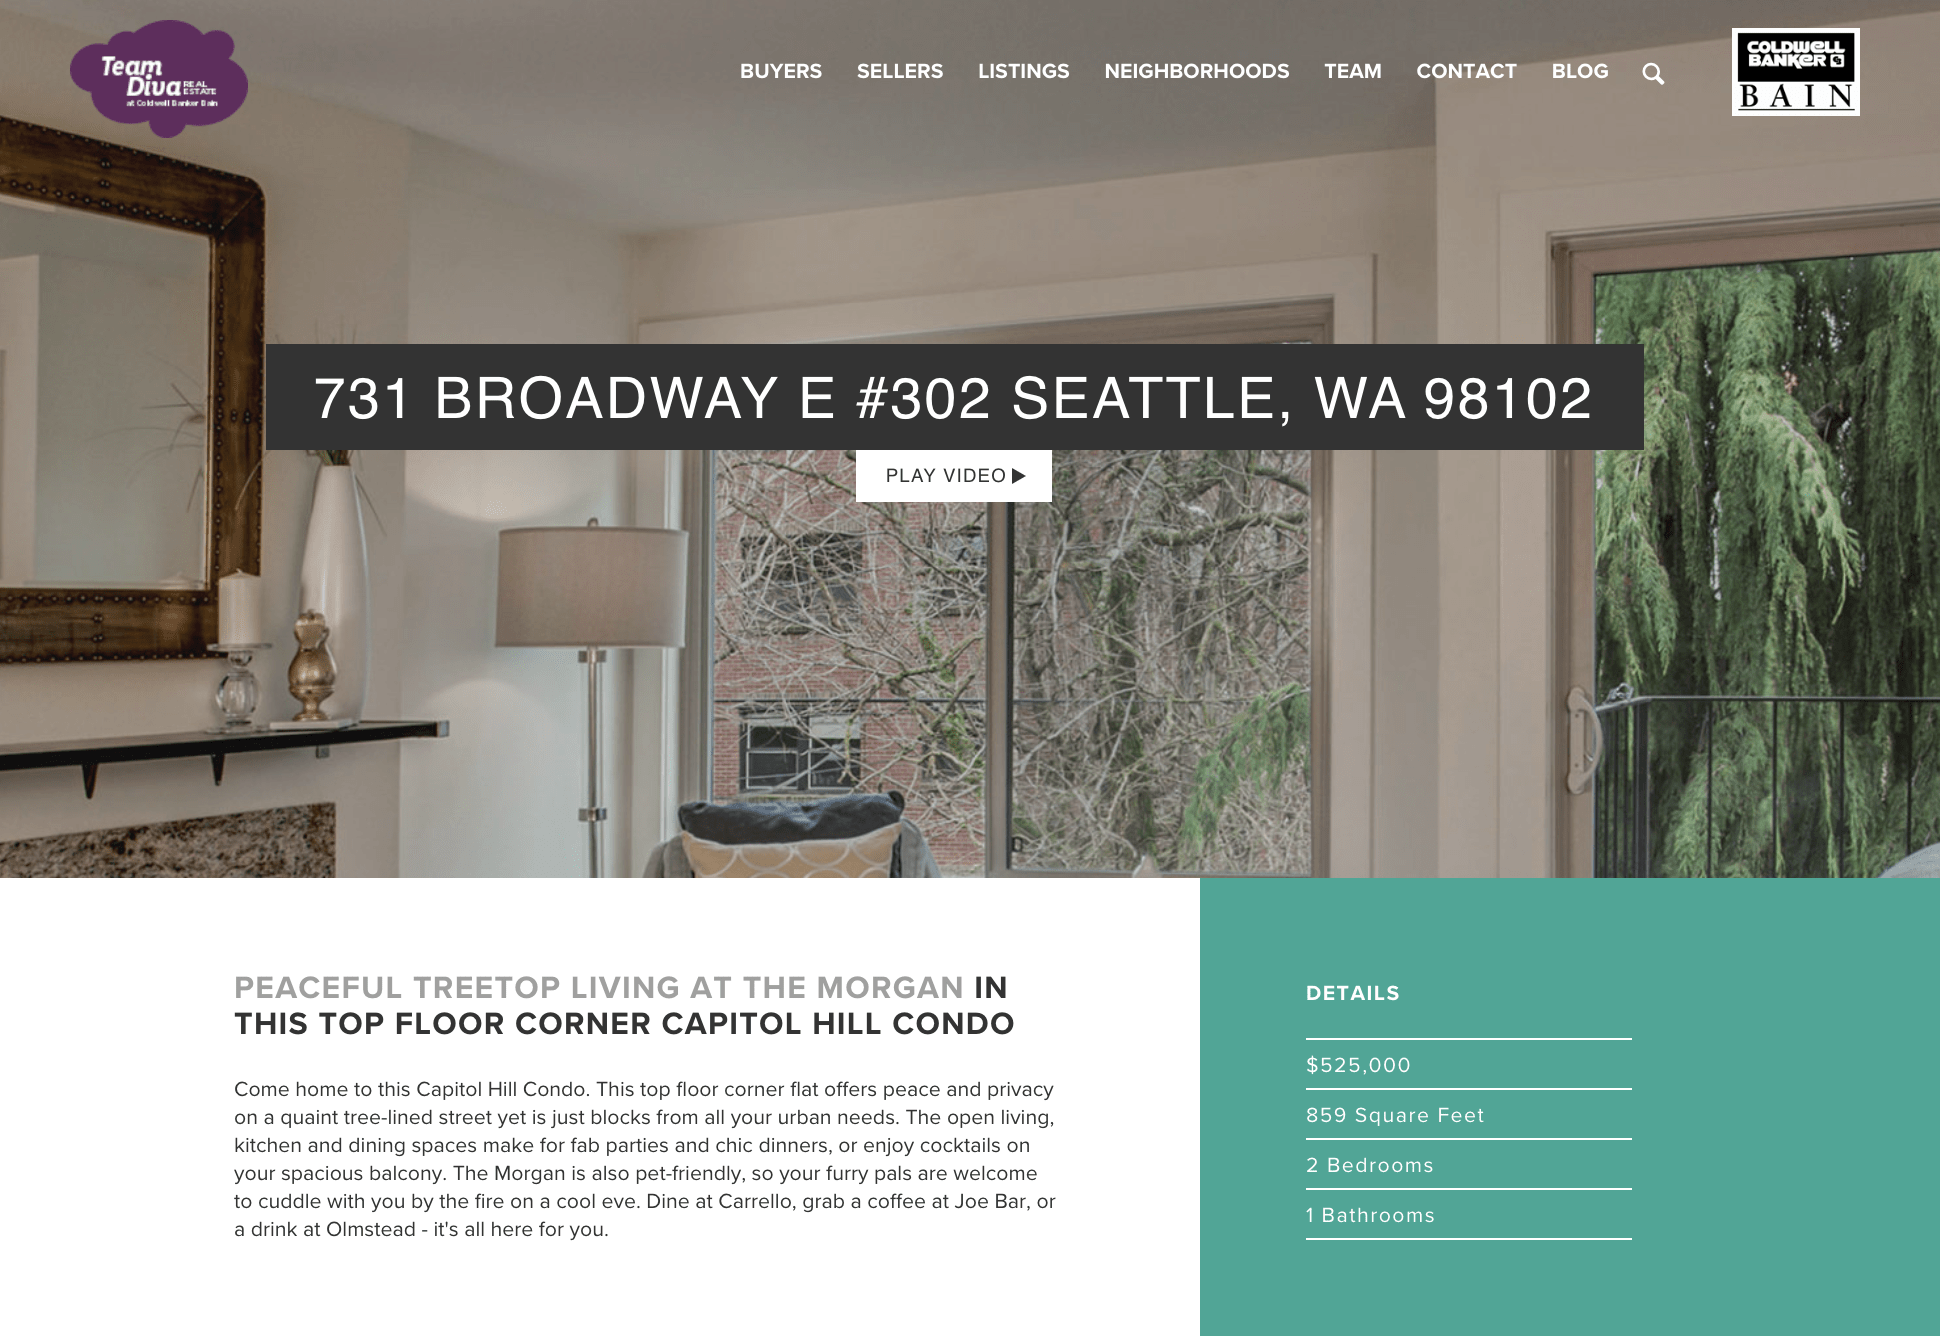 Just Sold Capitol Hill Condo - Website